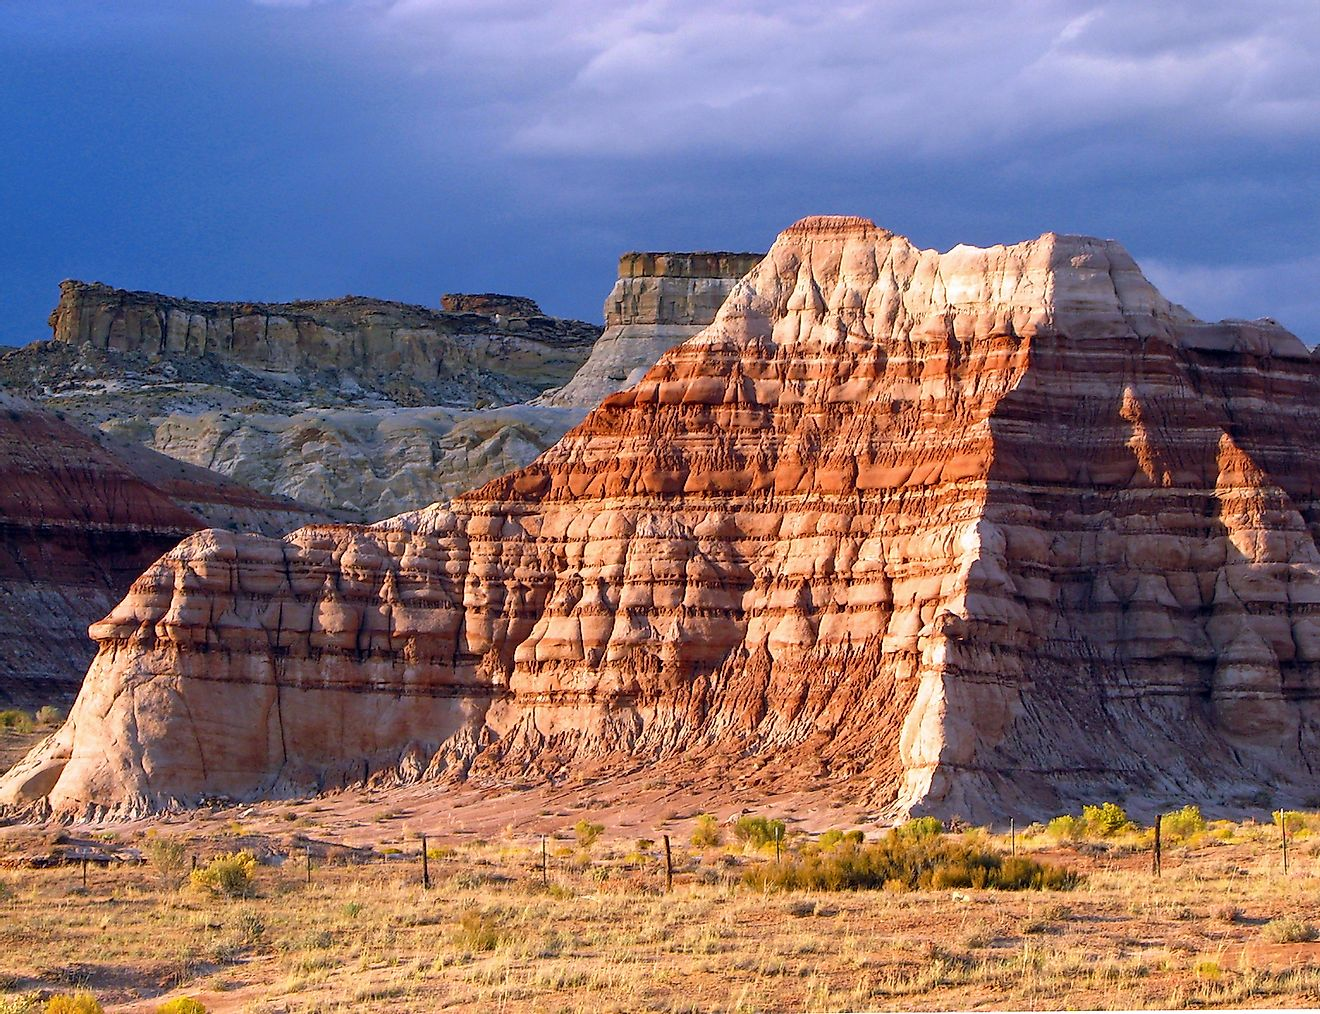 How Are Sedimentary Rocks Formed? - WorldAtlas